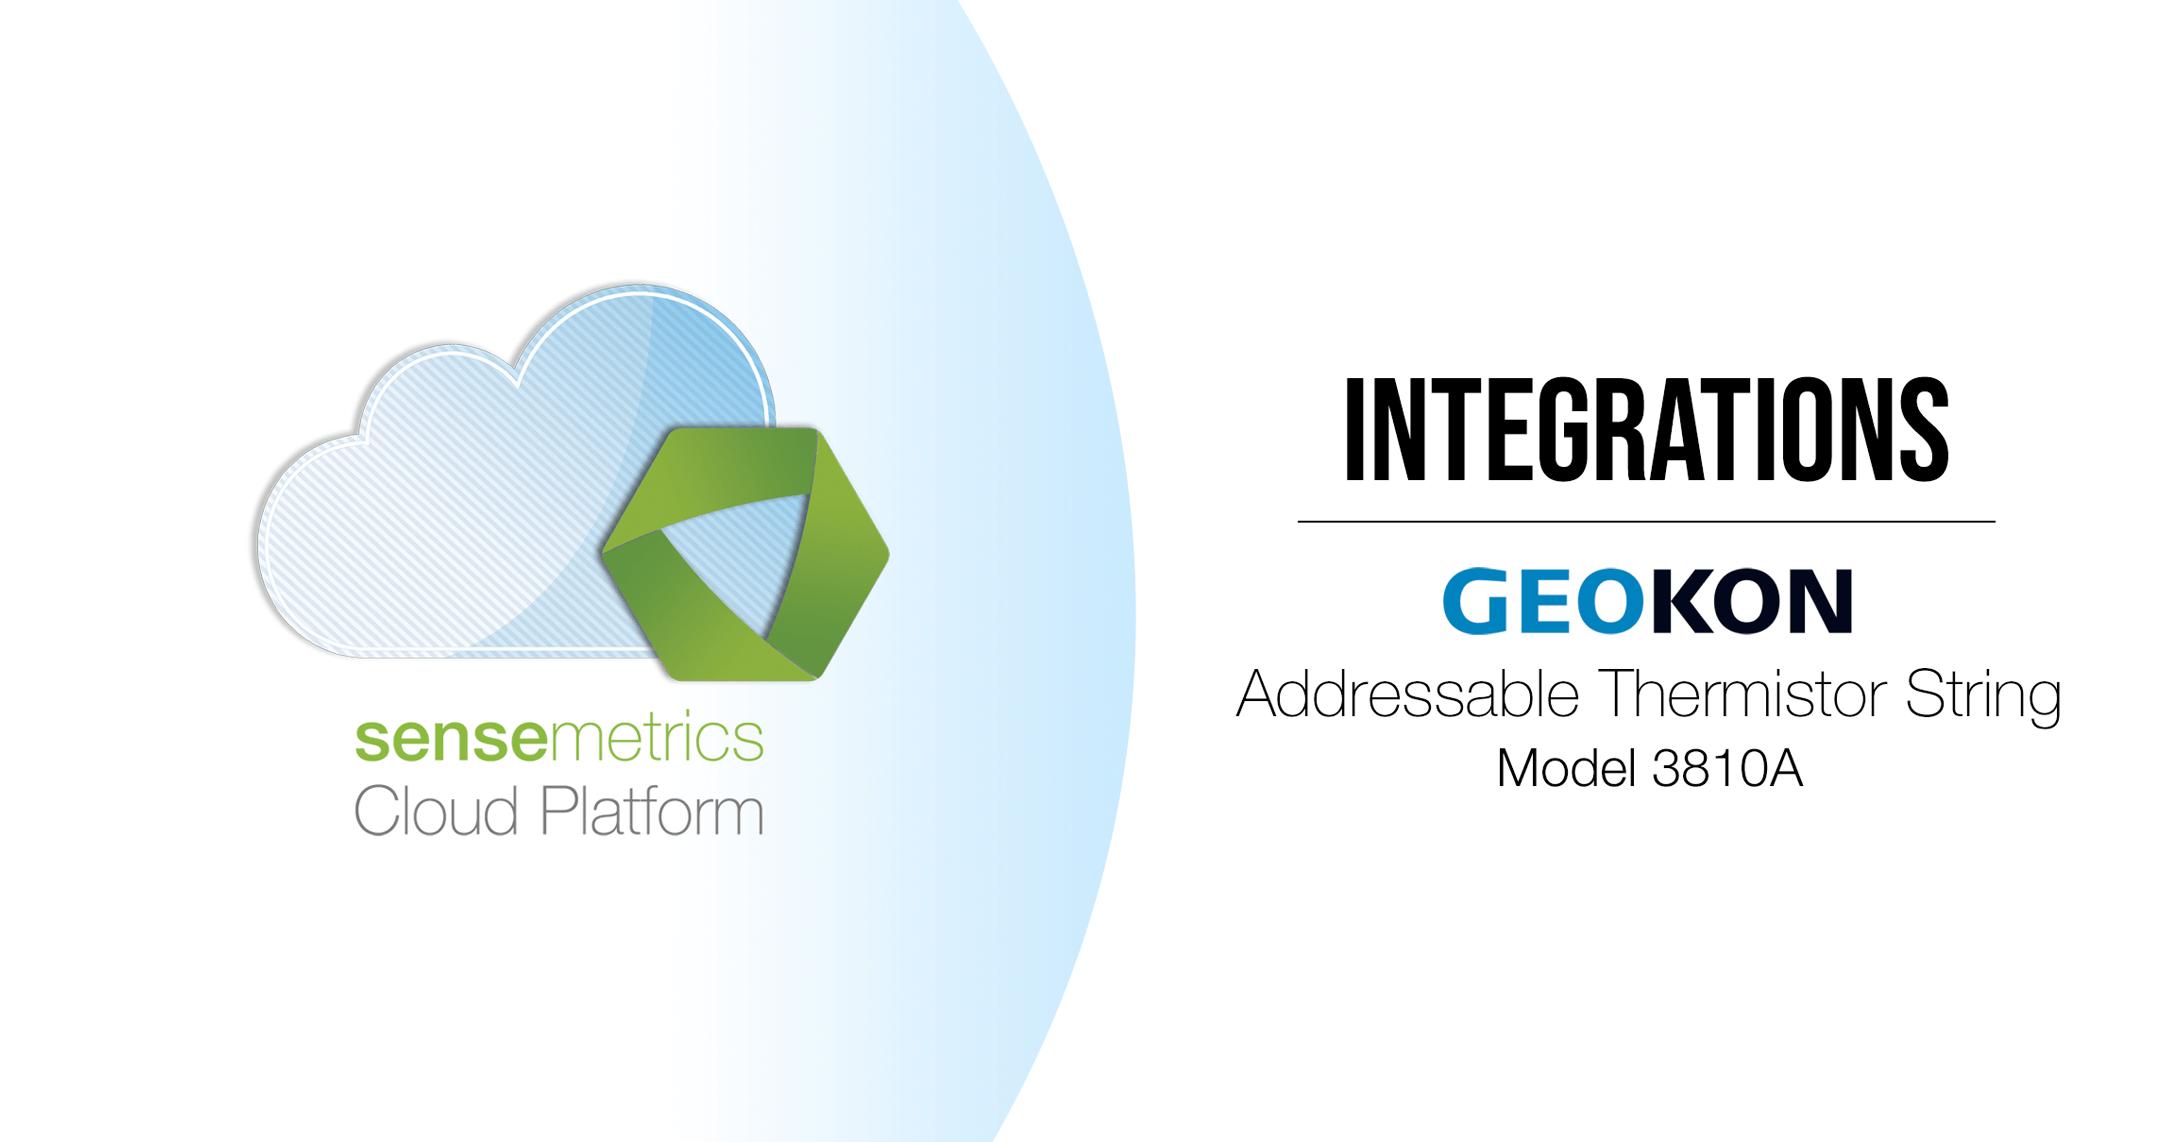 Integrations: Geokon 3810A